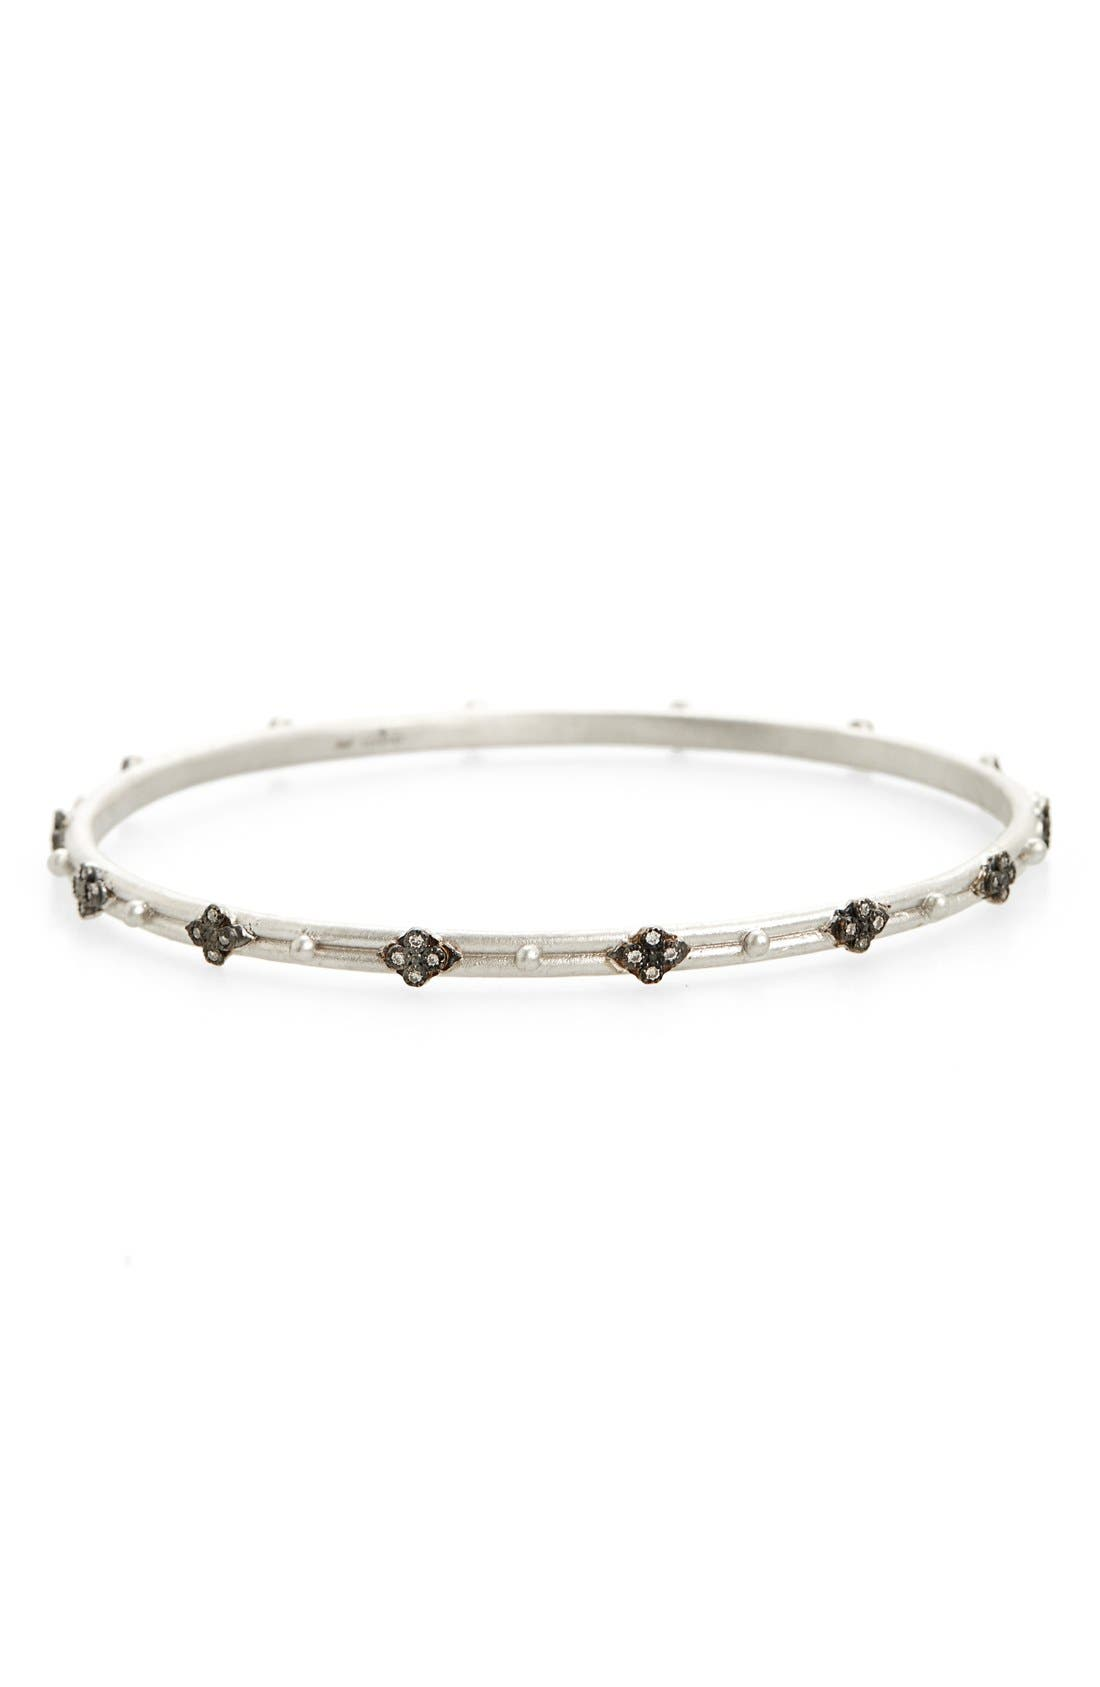 Alternate Image 1 Selected - Armenta New World Cravelli Diamond Bangle